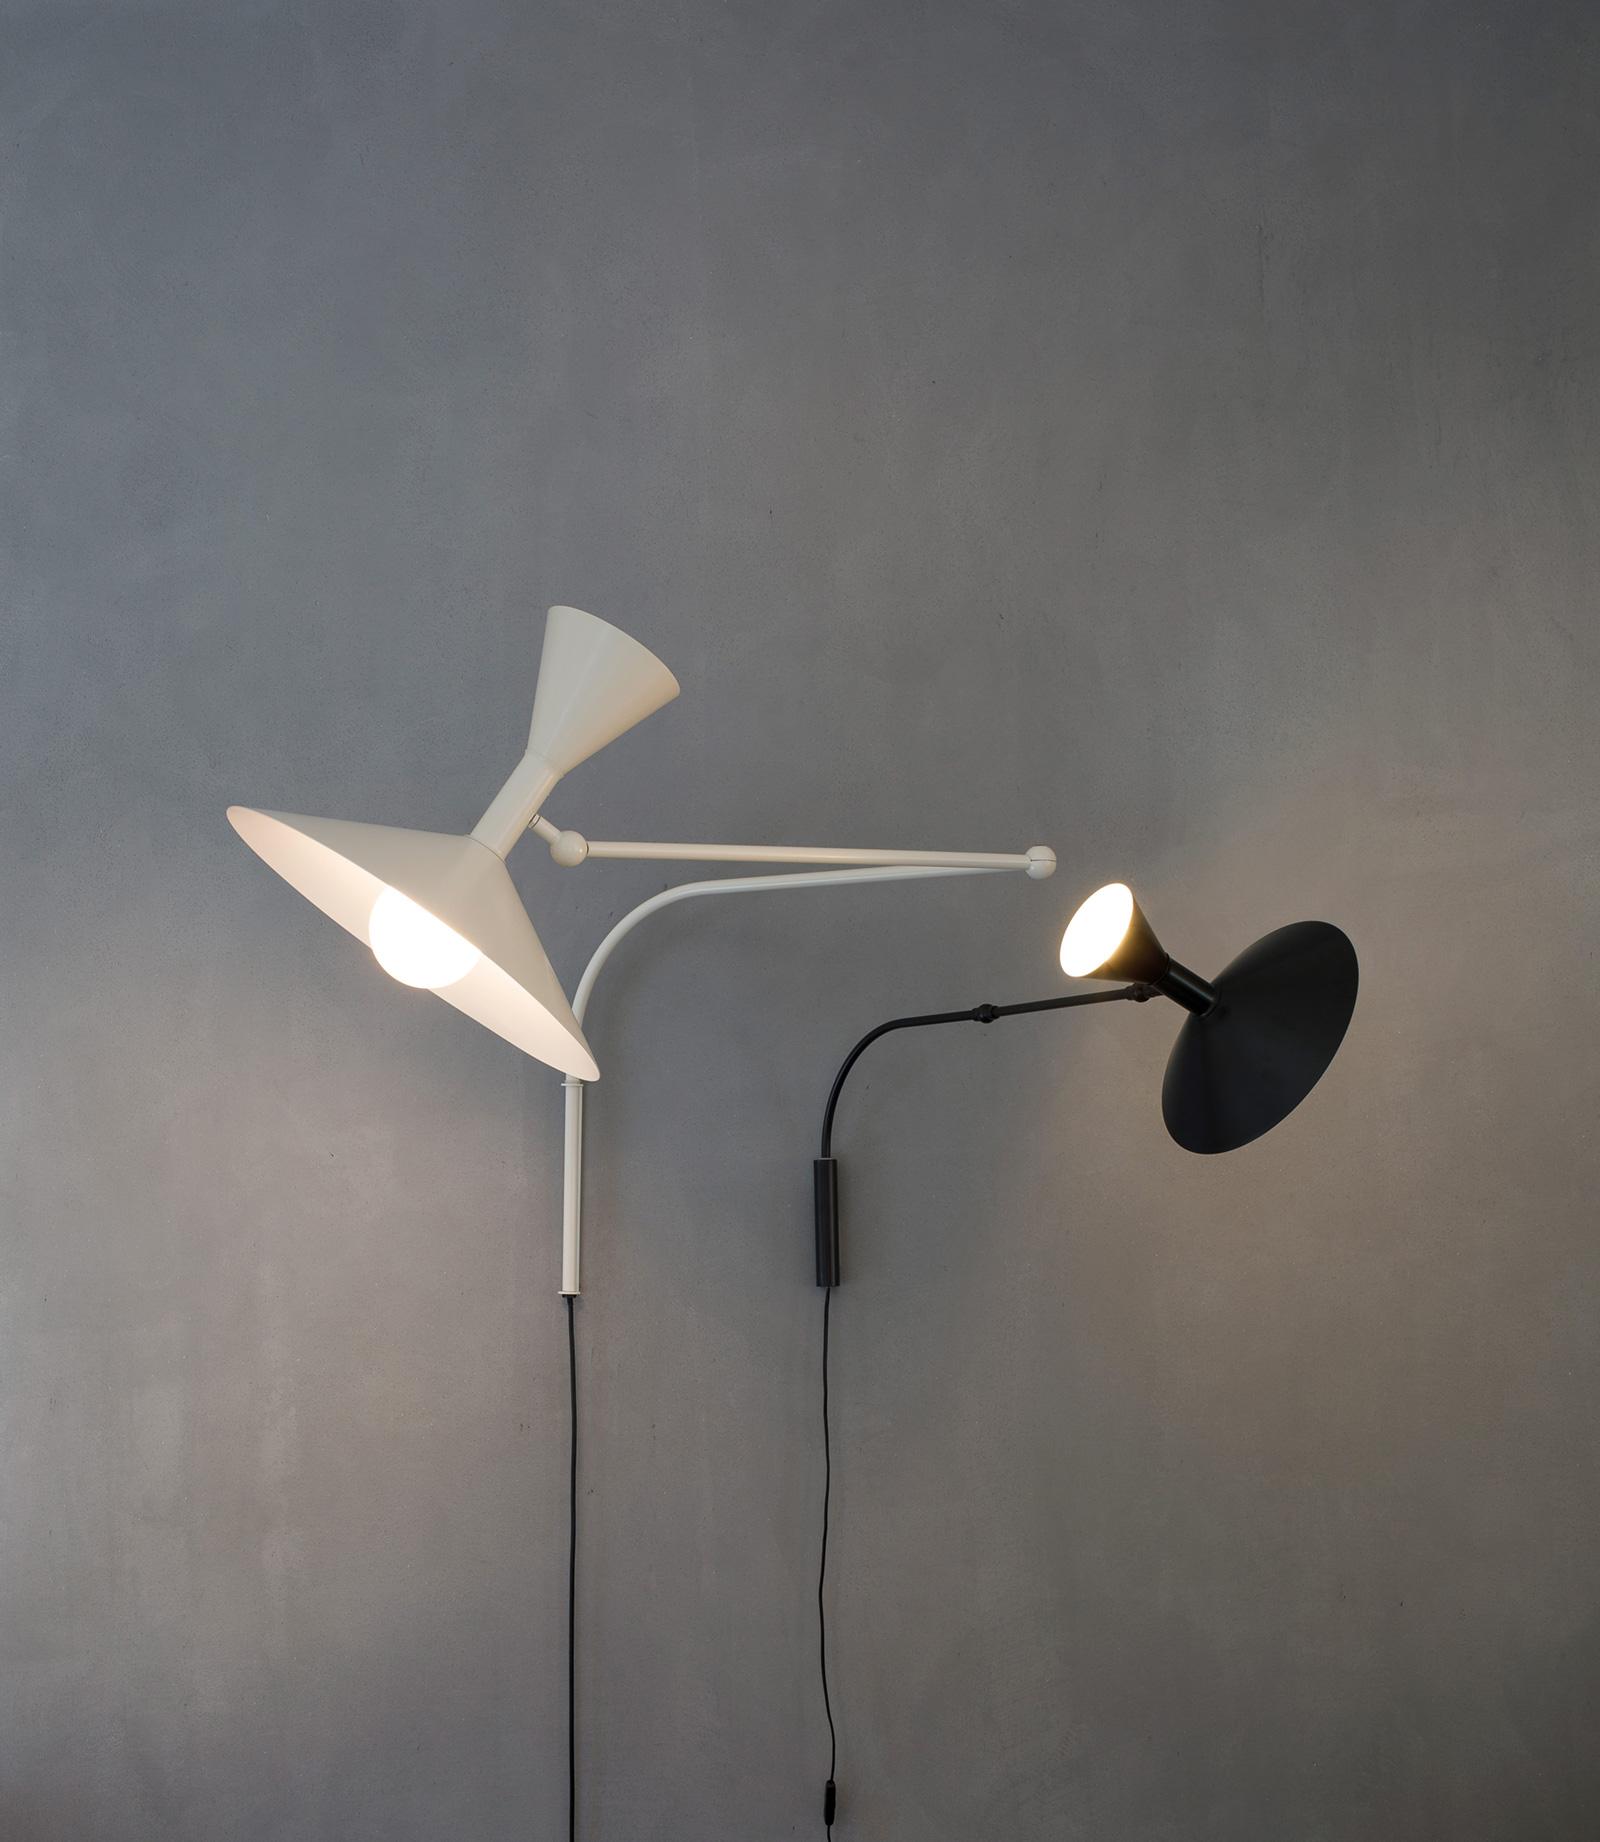 TinnappelMetz-nemo-Mini-Lampe-de-Marseille-wall-lamp-02